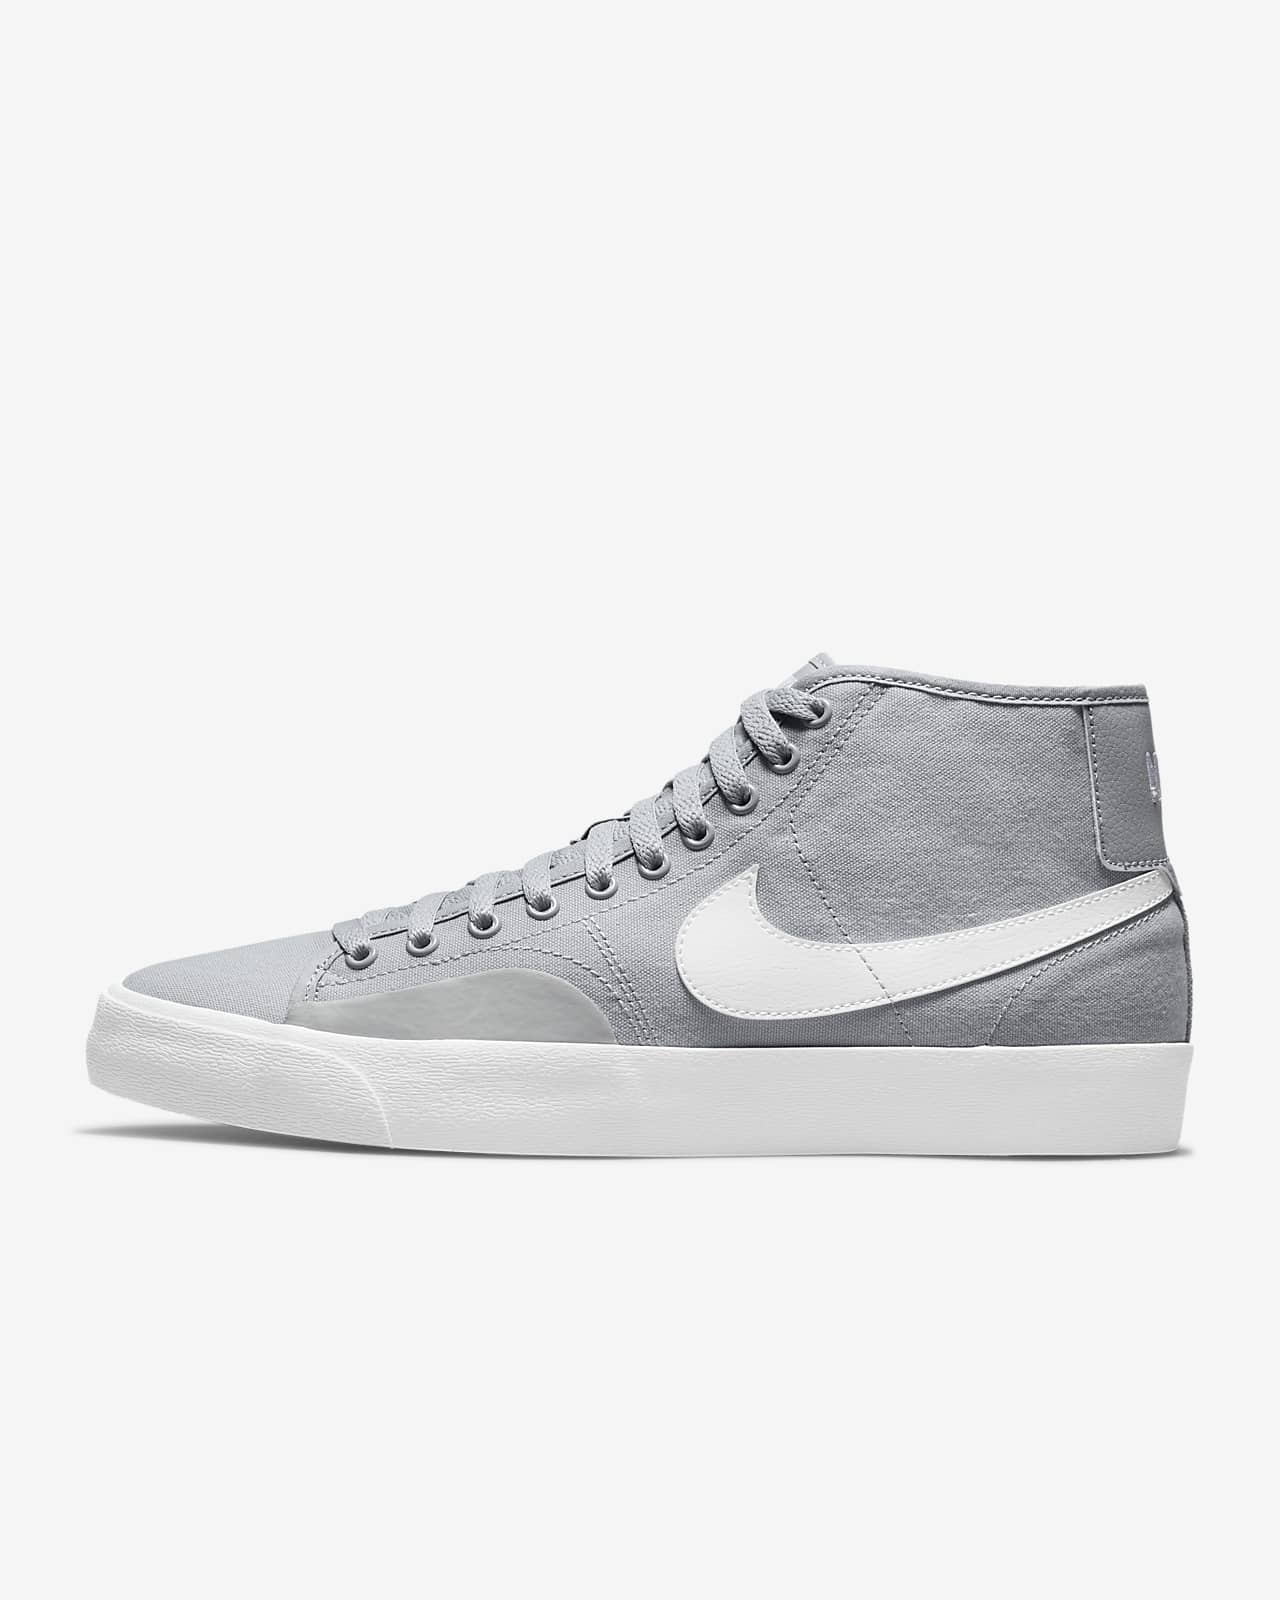 Calzado de skateboarding Nike SB BLZR Court Mid